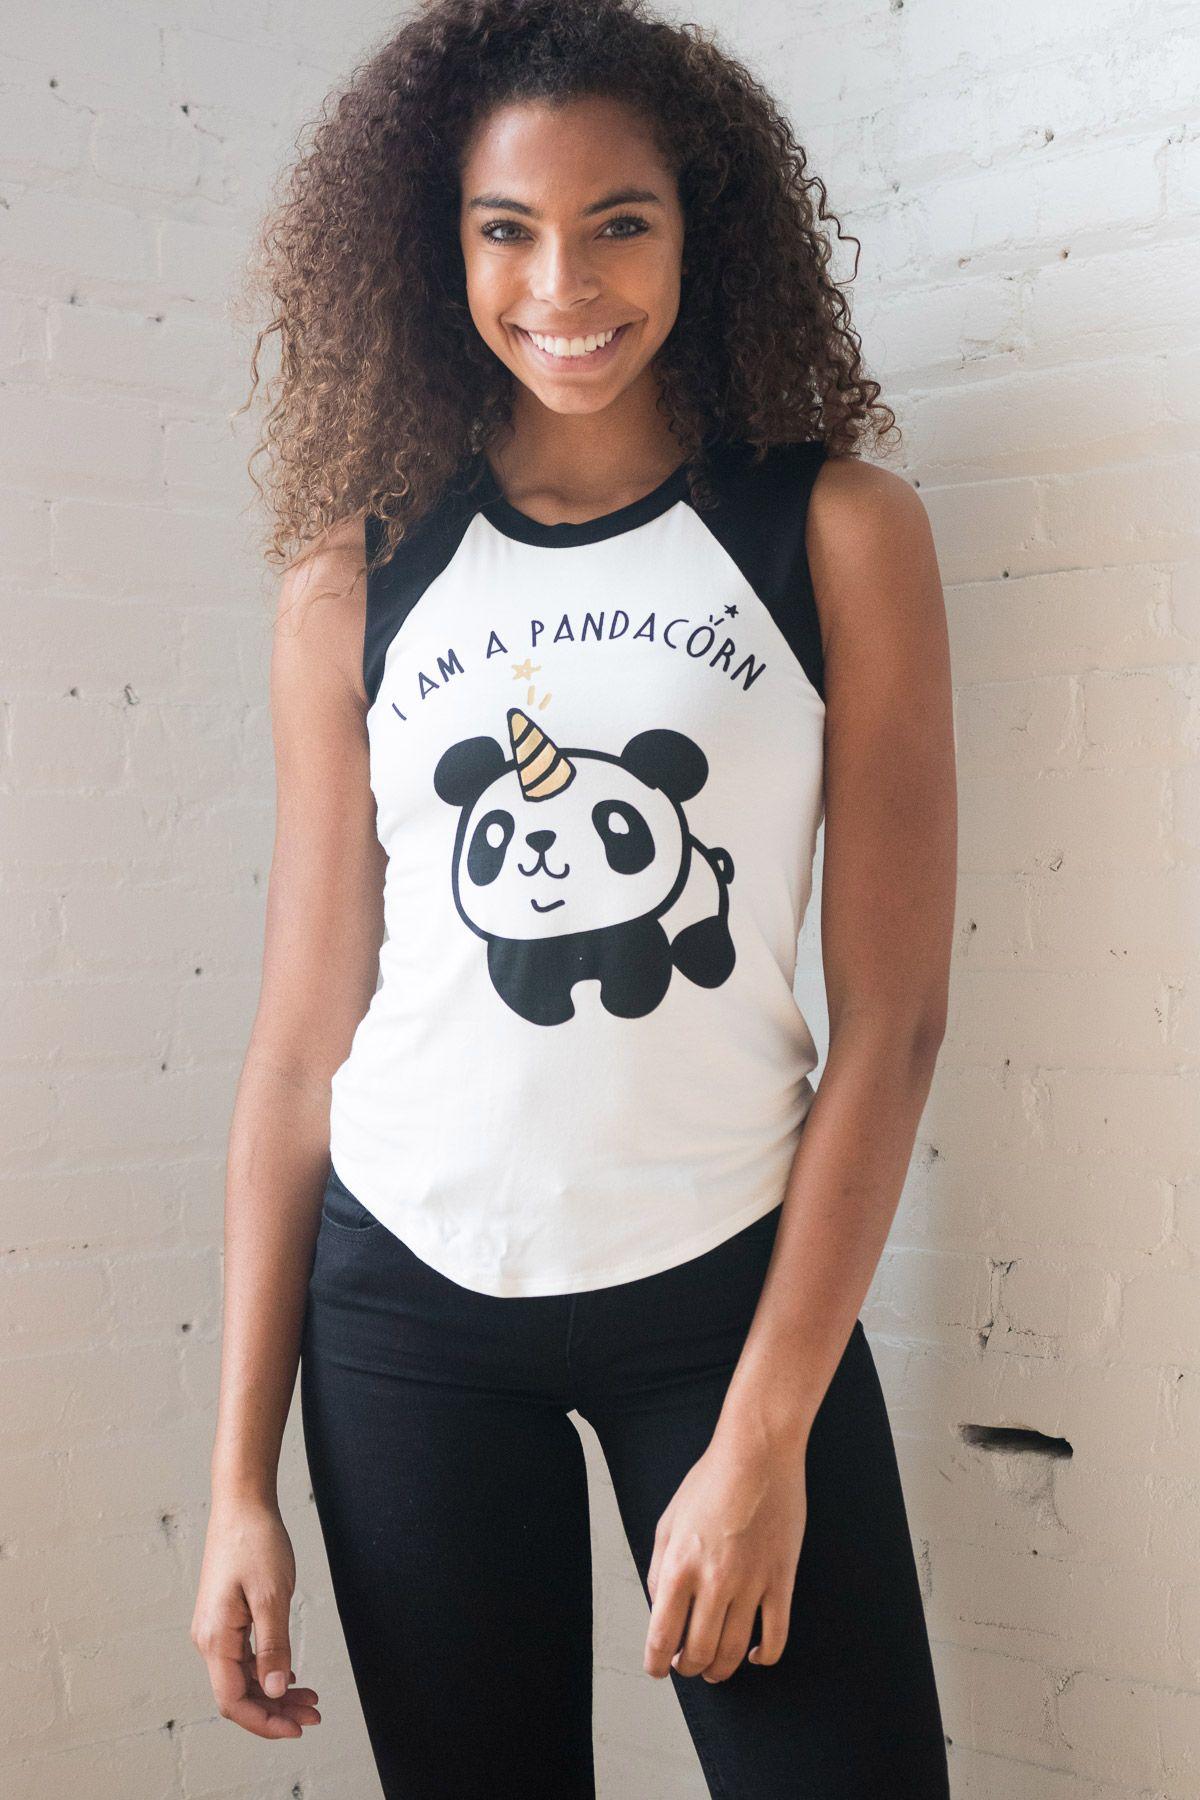 b65d2af45f669 I am a Pandacorn!!  14.99